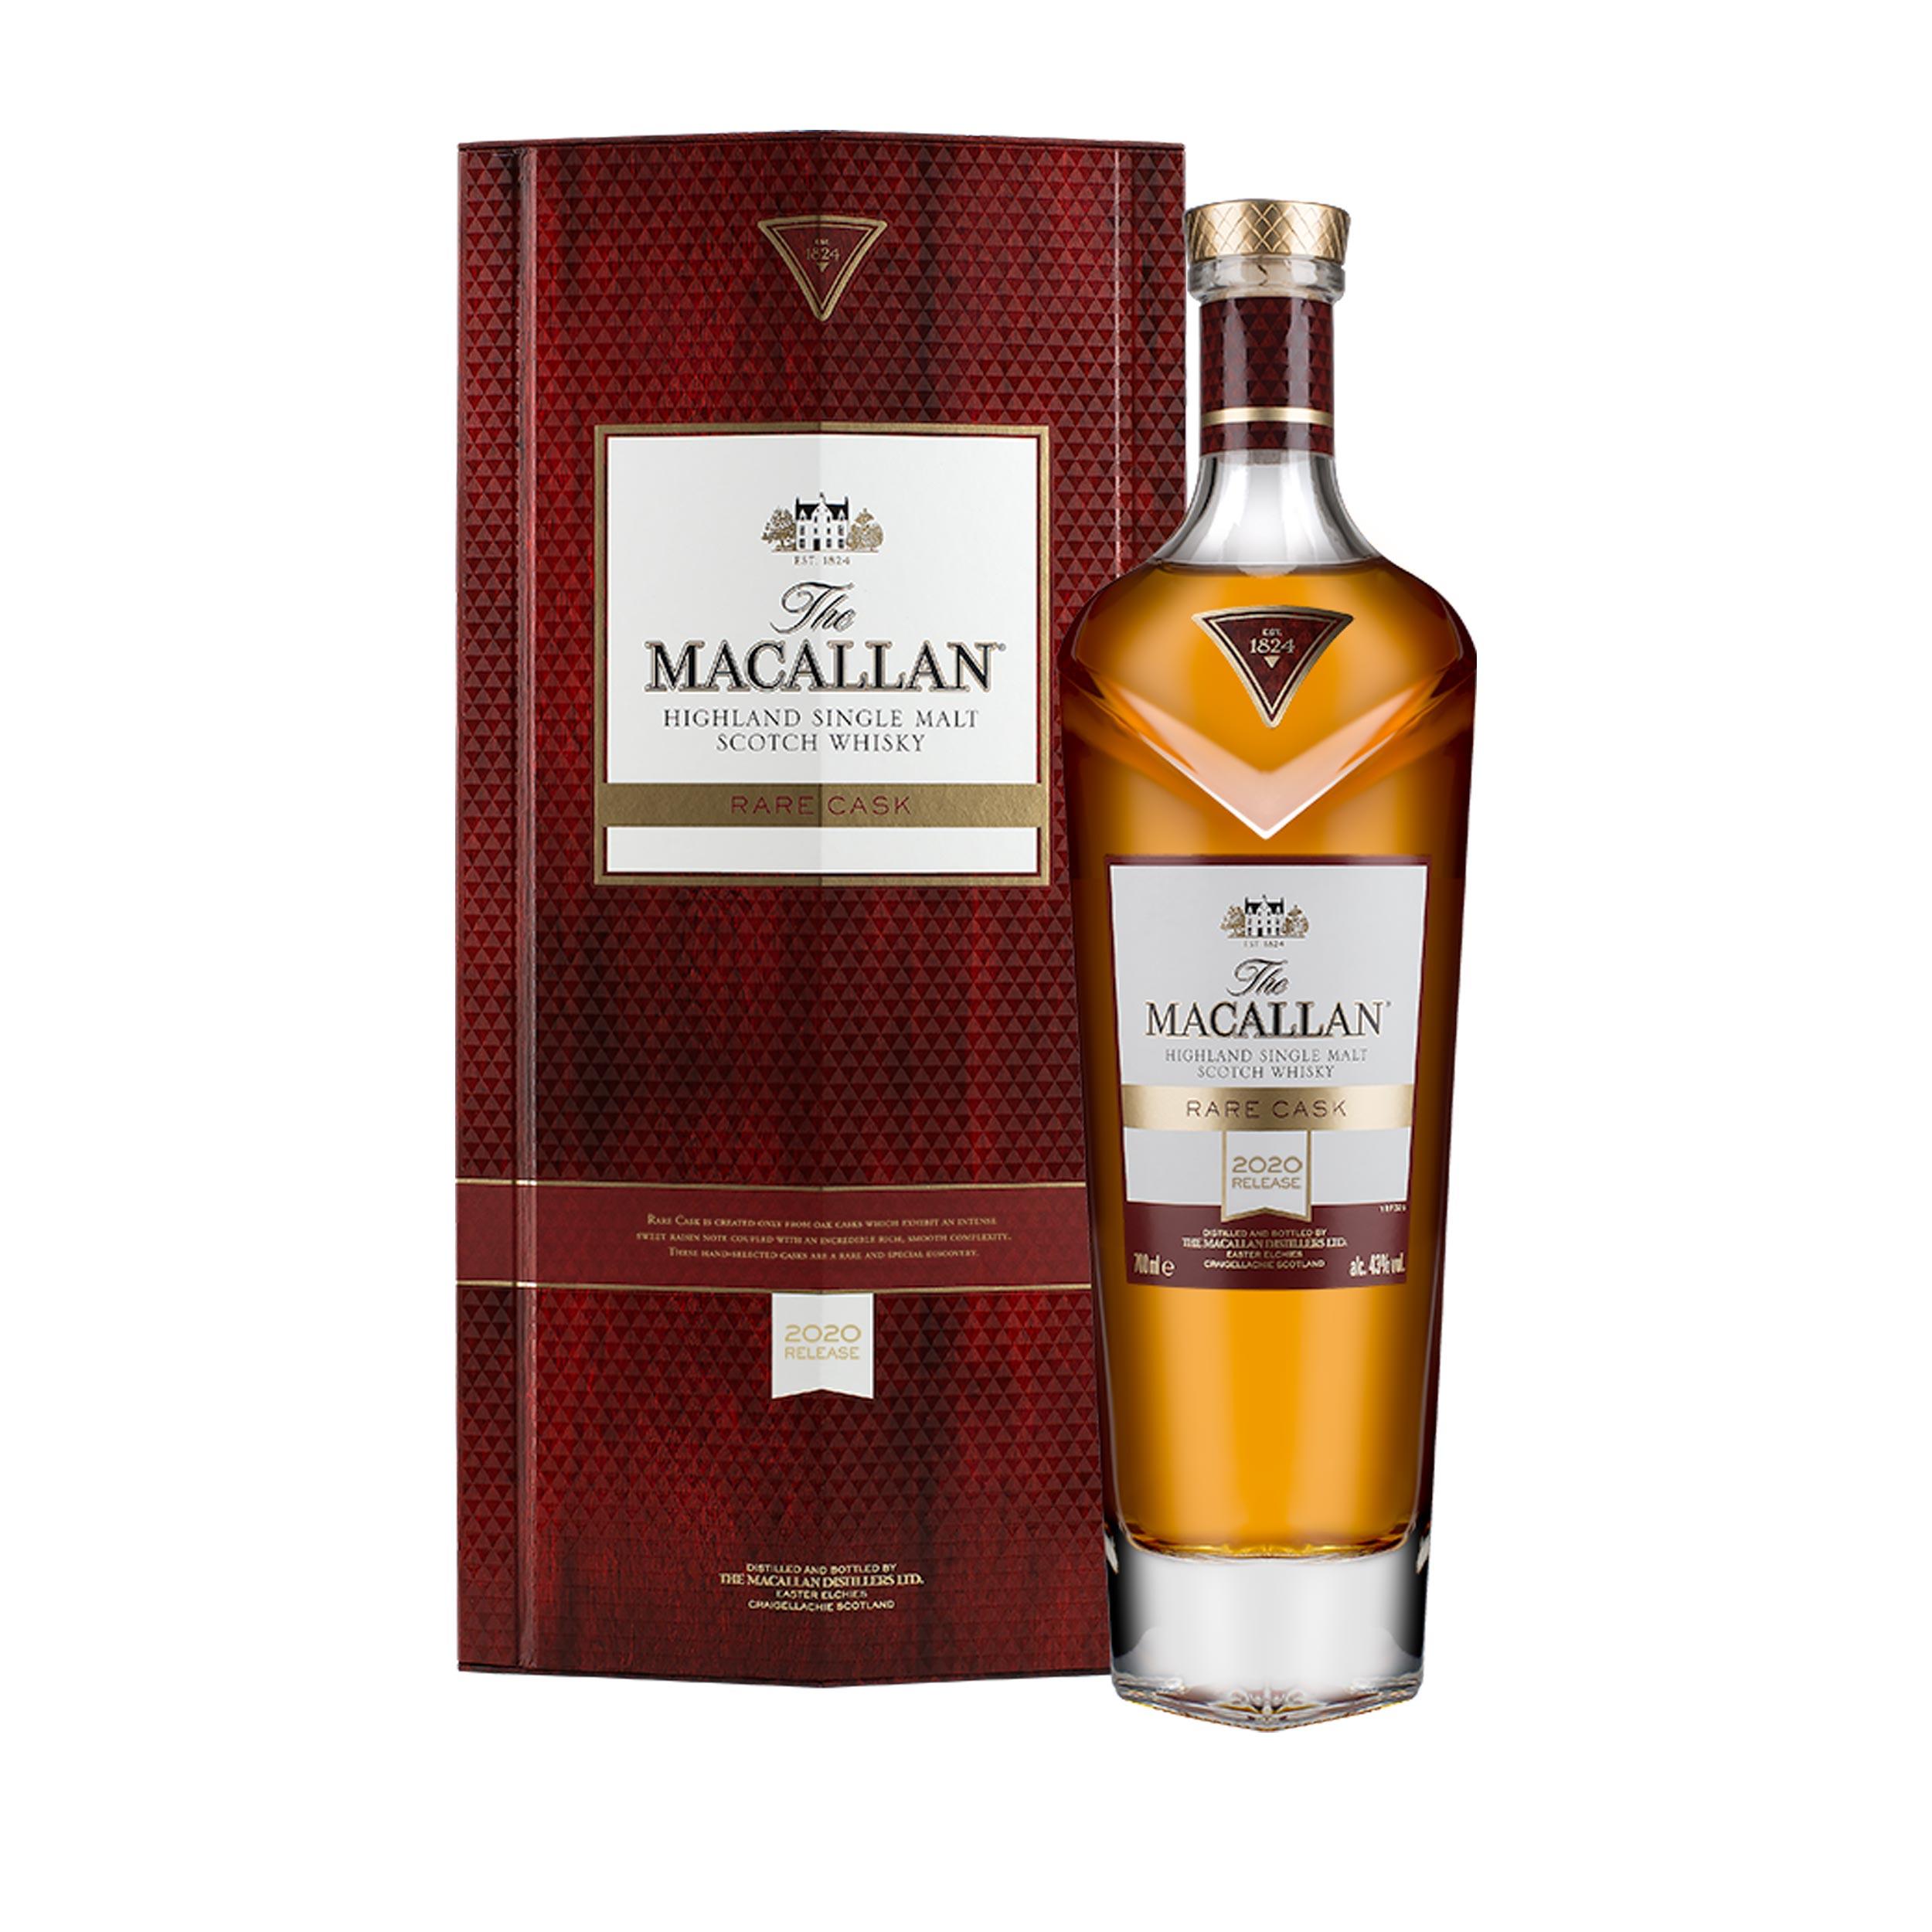 Macallan Rare Cask 2020 Release Limited Edition Speyside Single Malt Scotch Whisky 70cl